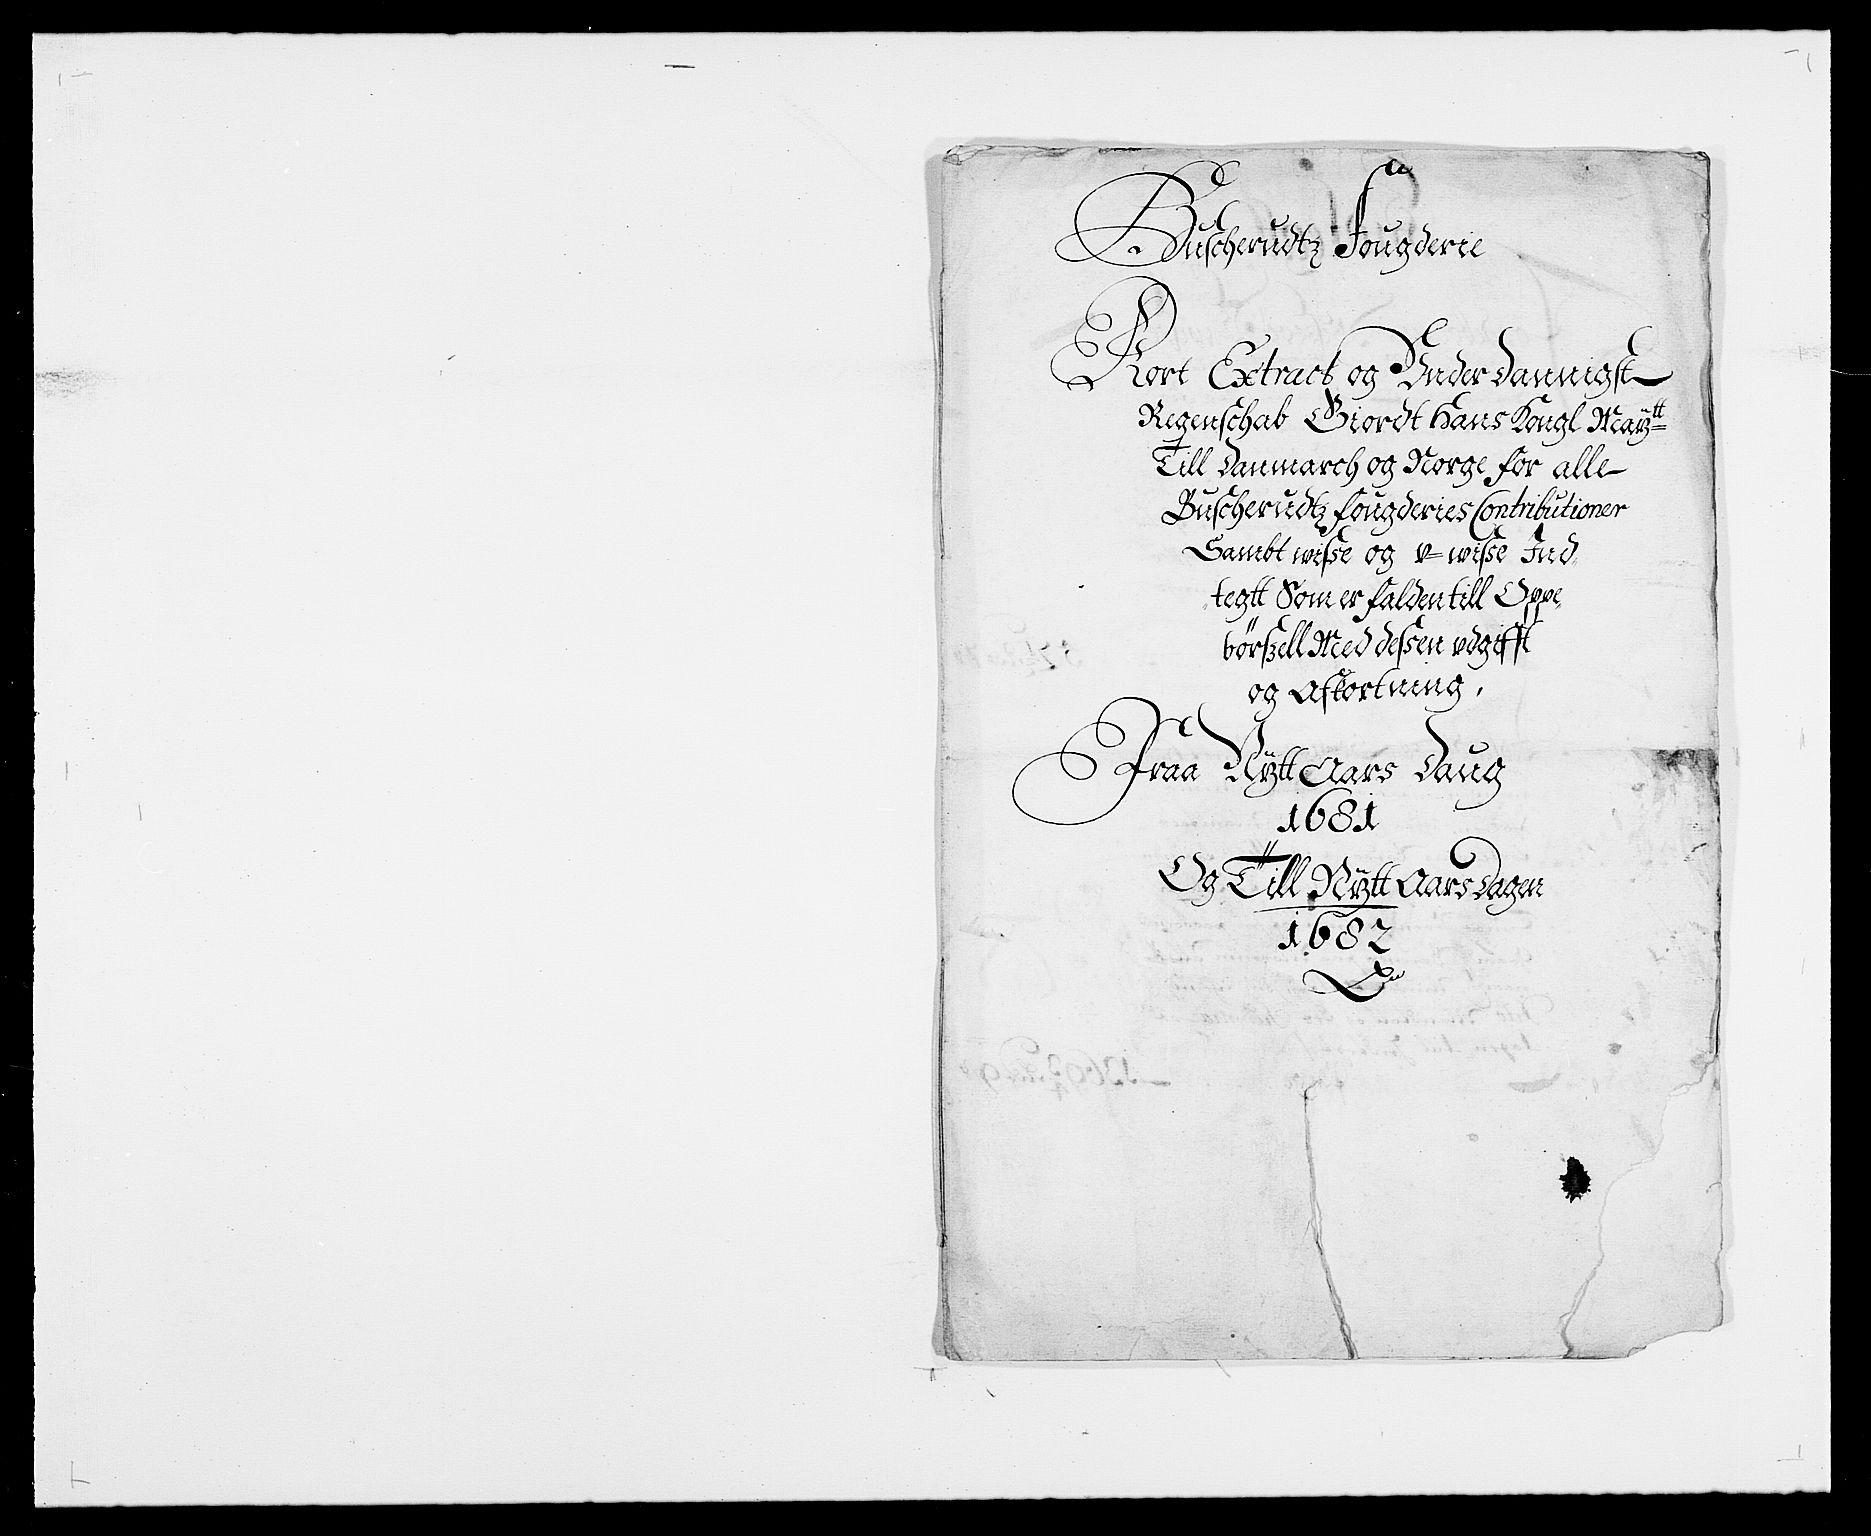 RA, Rentekammeret inntil 1814, Reviderte regnskaper, Fogderegnskap, R25/L1675: Fogderegnskap Buskerud, 1678-1681, s. 193